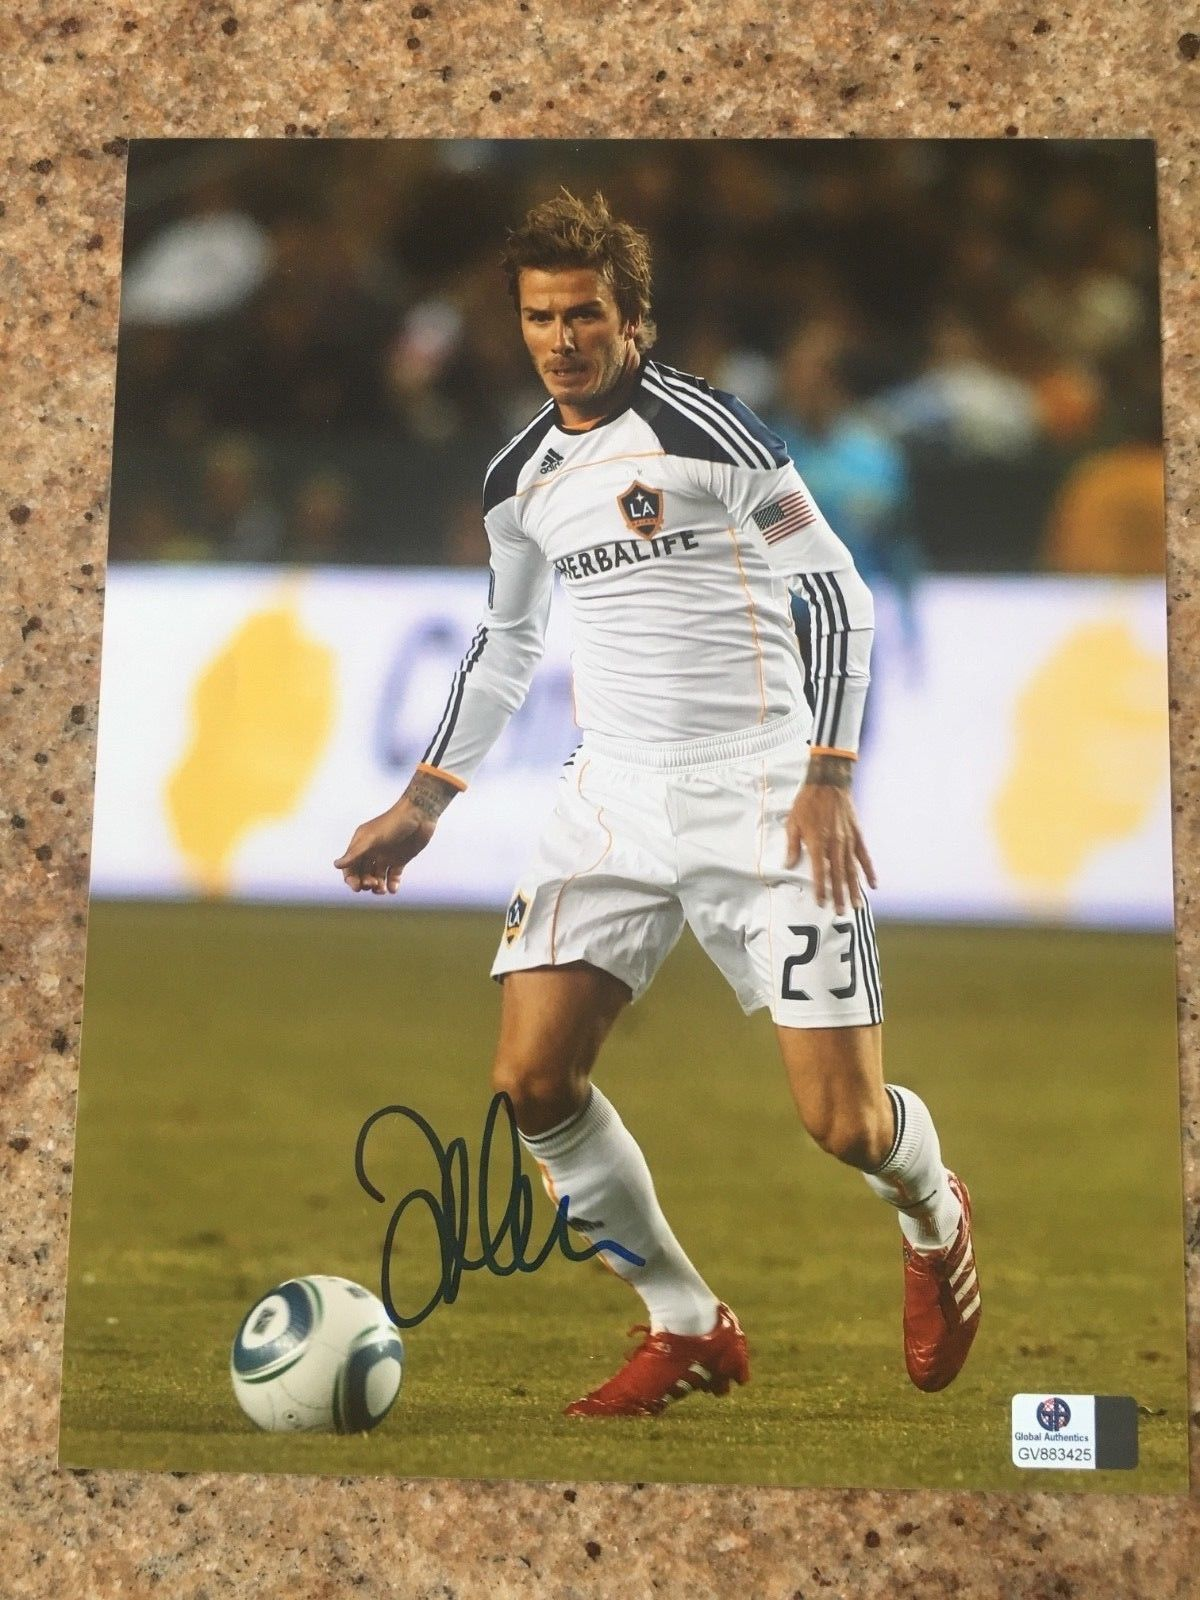 David Beckham Galaxy England Manchester Real Madrid World Cup 8x10 photo GA  COA (eBay Link) e13381406